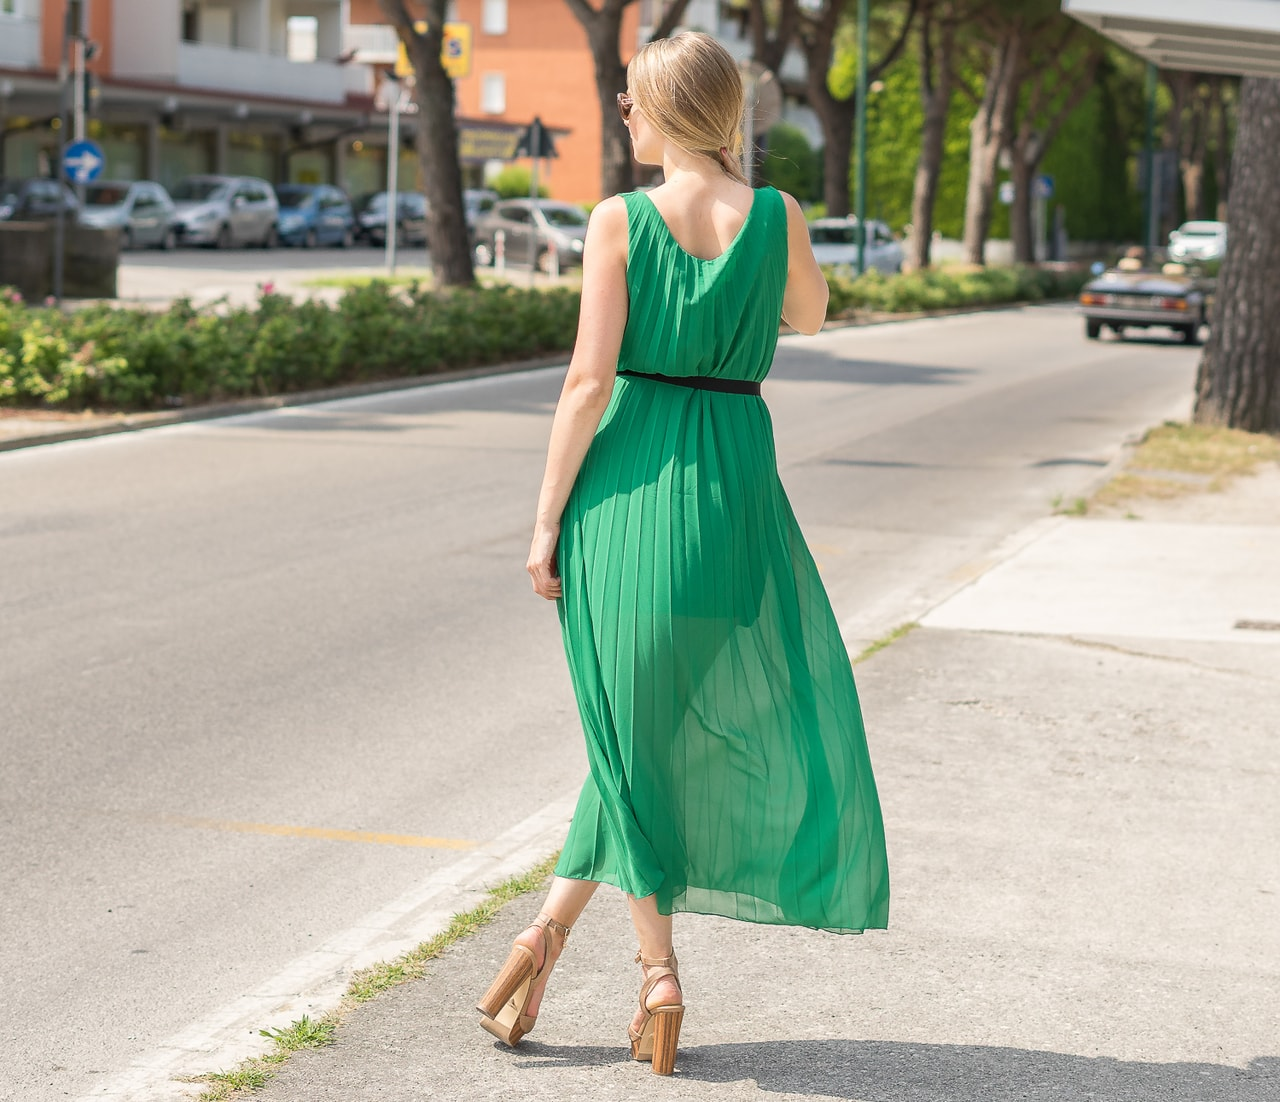 Glamadise.sk - Dlhé šaty zelené plisované - Glamorous by Glam ... ad5944a49a